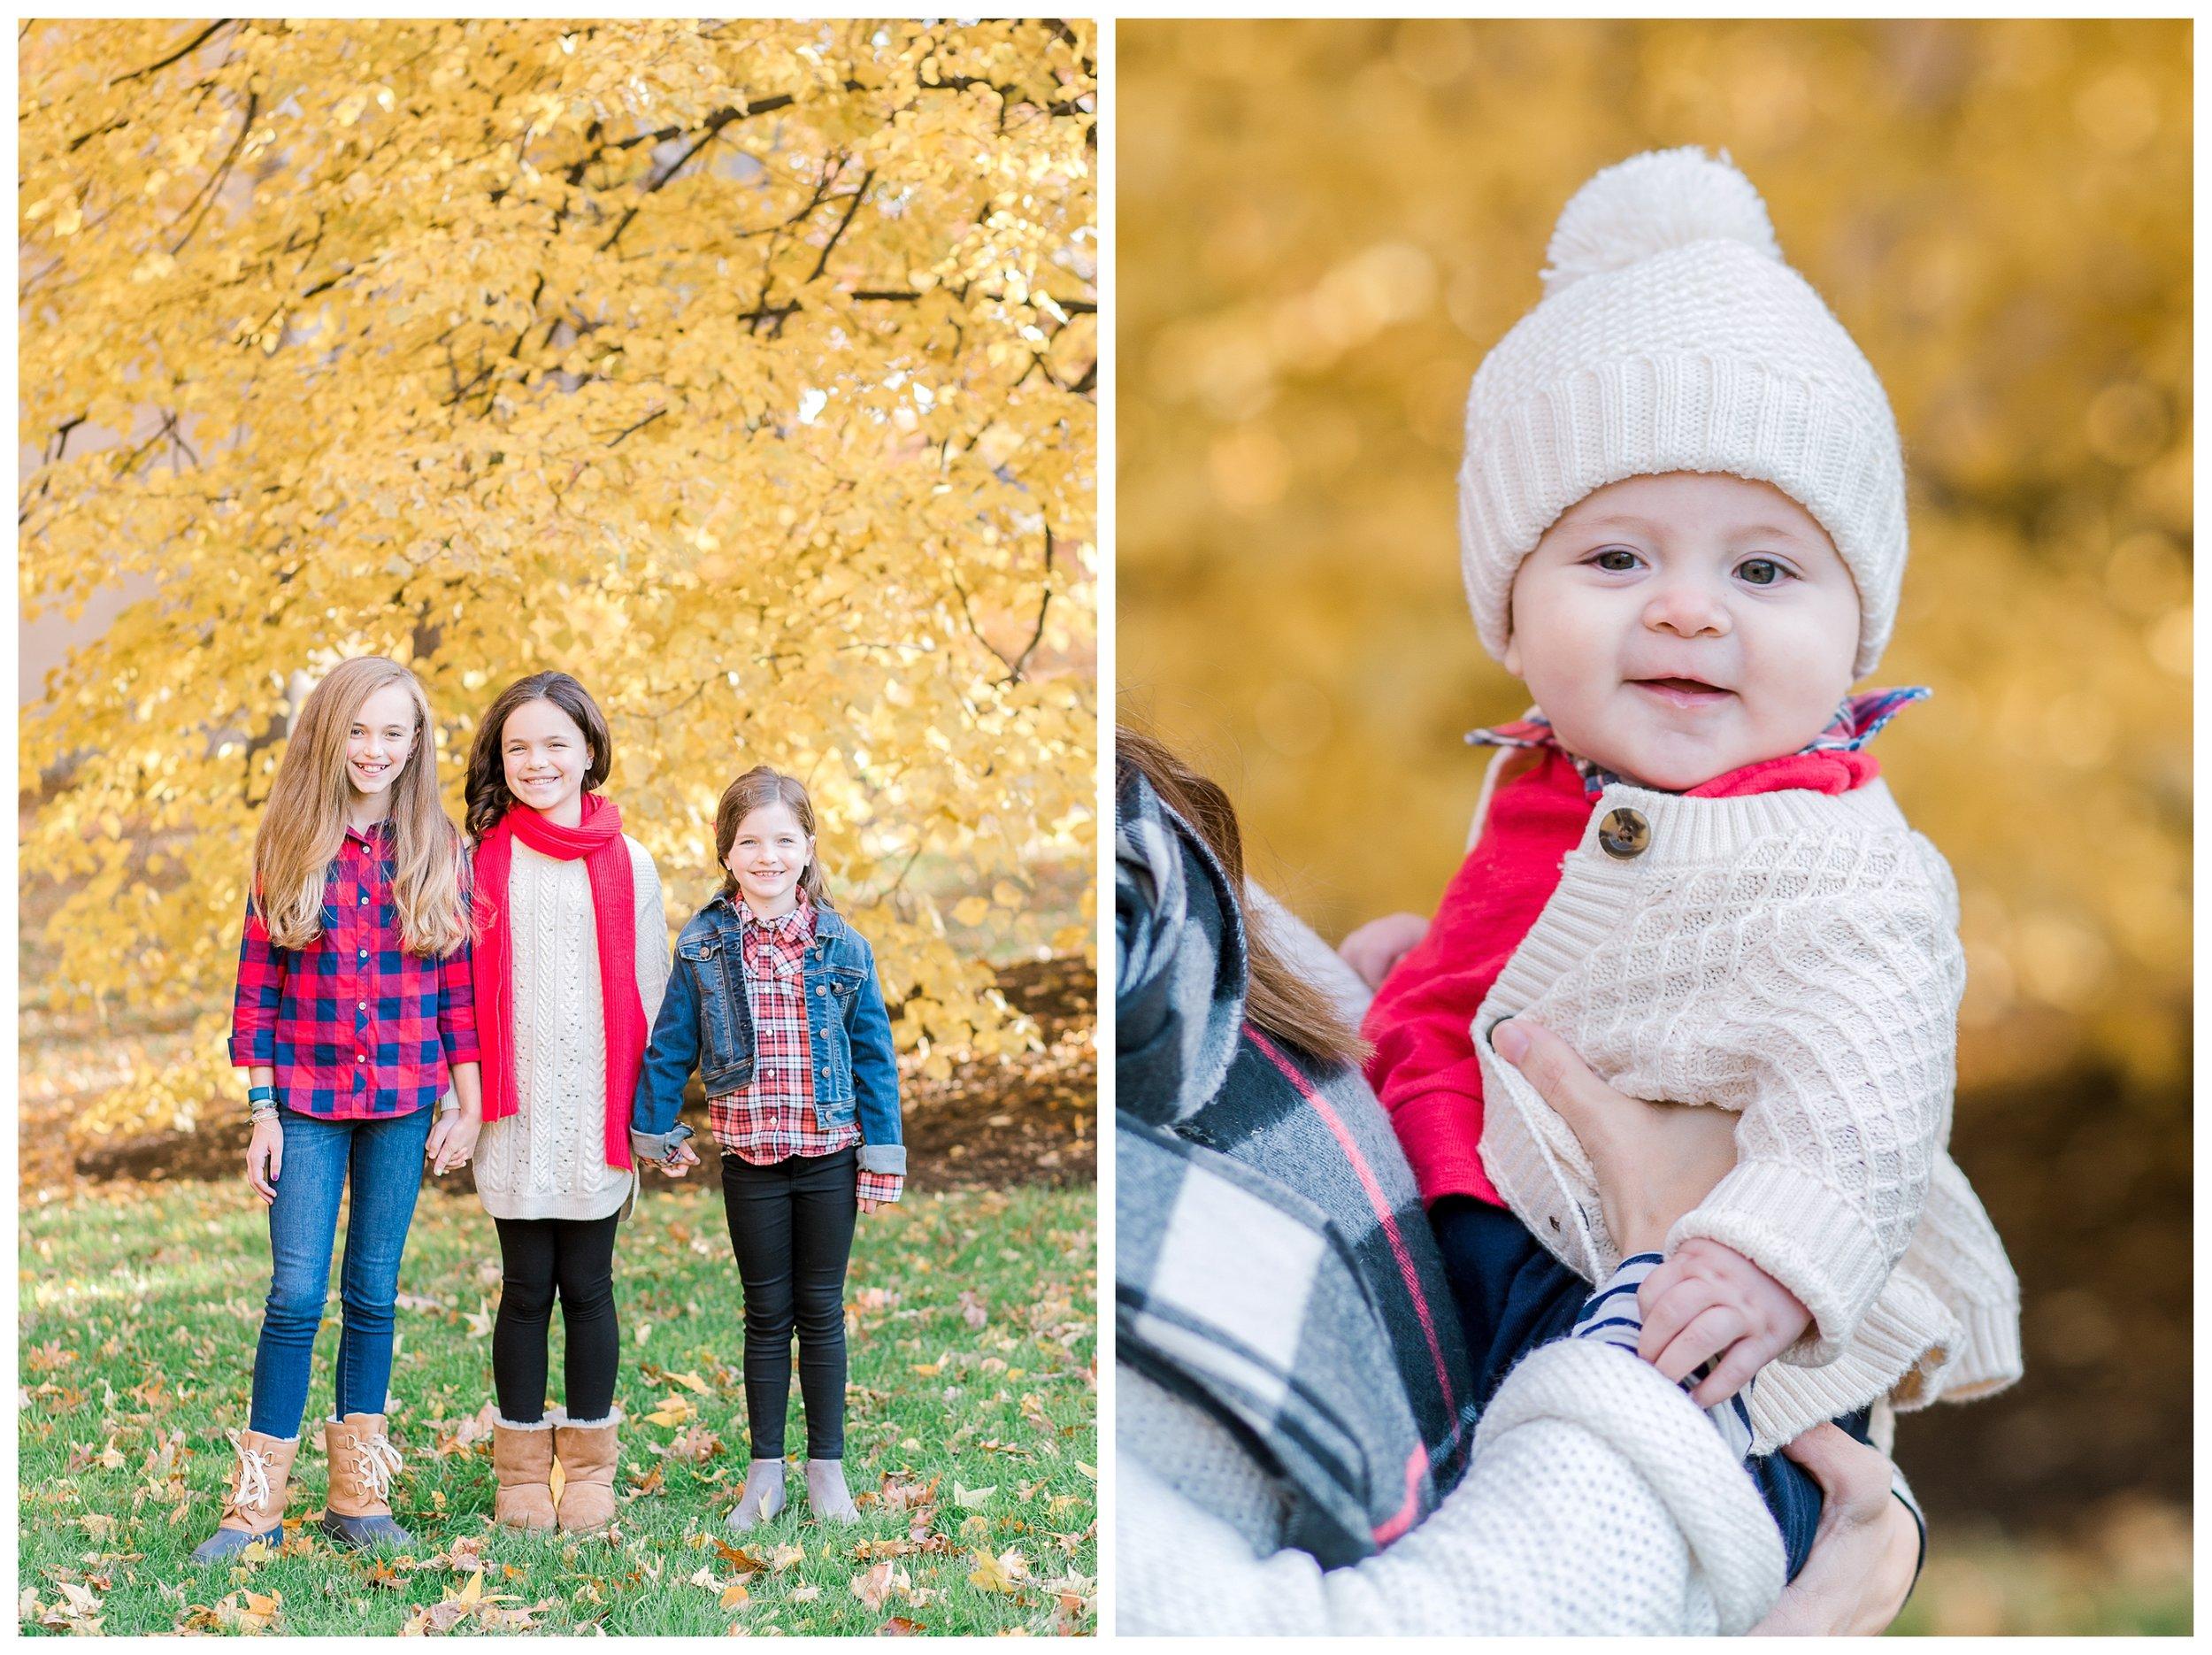 wellesley_fall_family_photographer_erica_pezente_photo (9).jpg